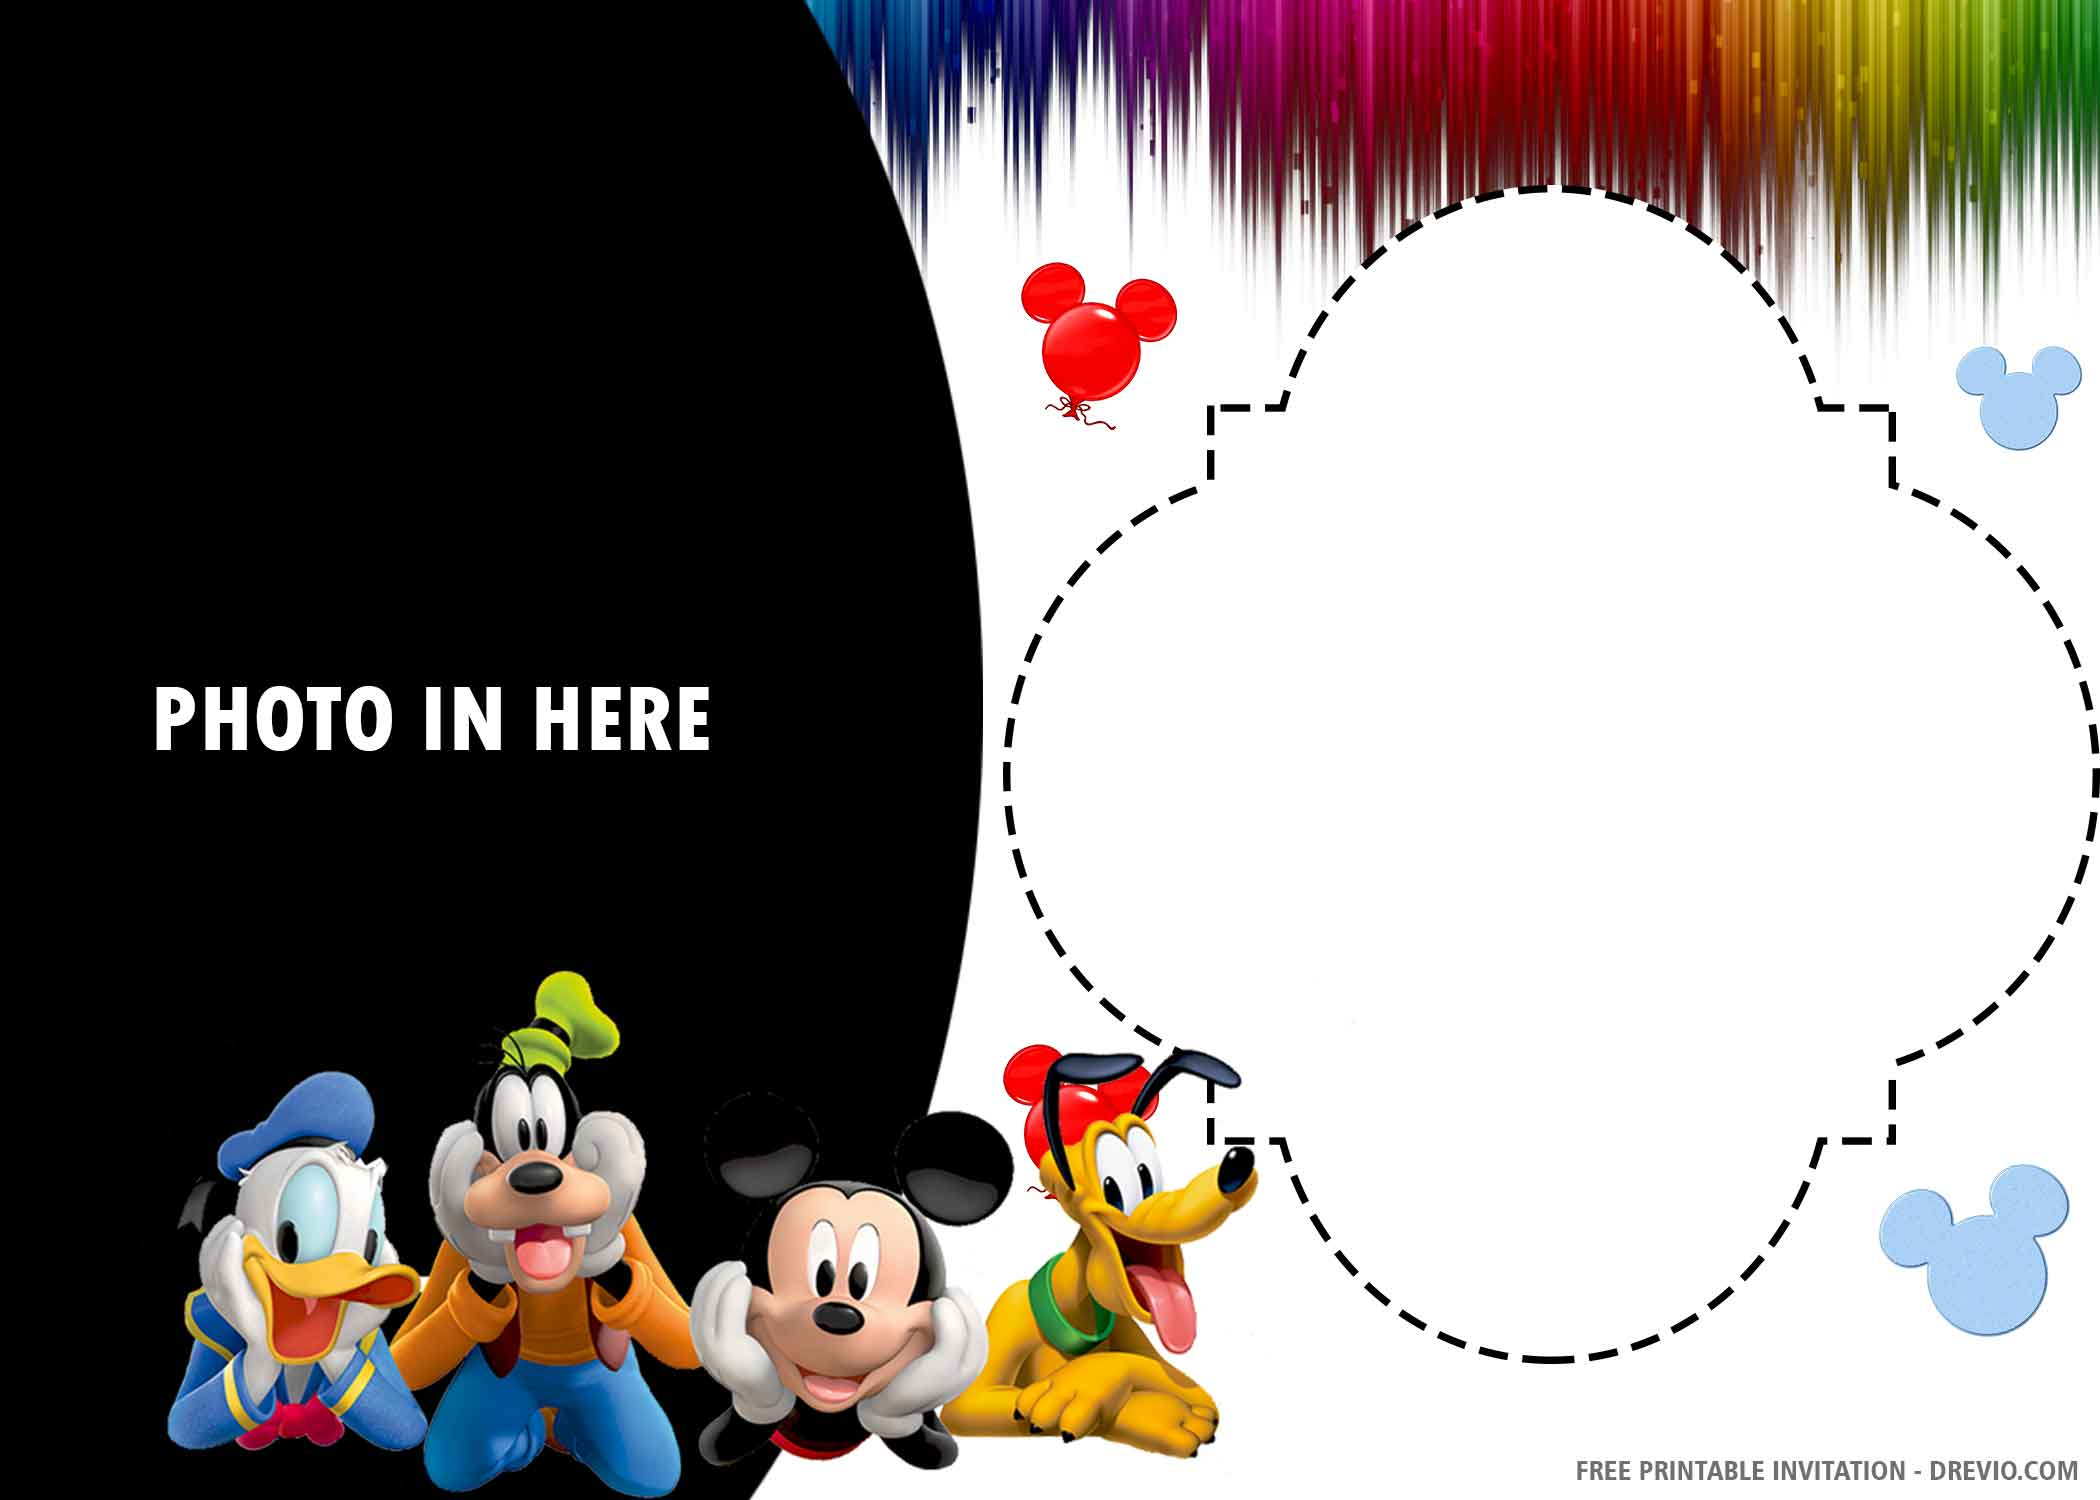 Free Printable Baby Mickey Mouse Birthday Invitation